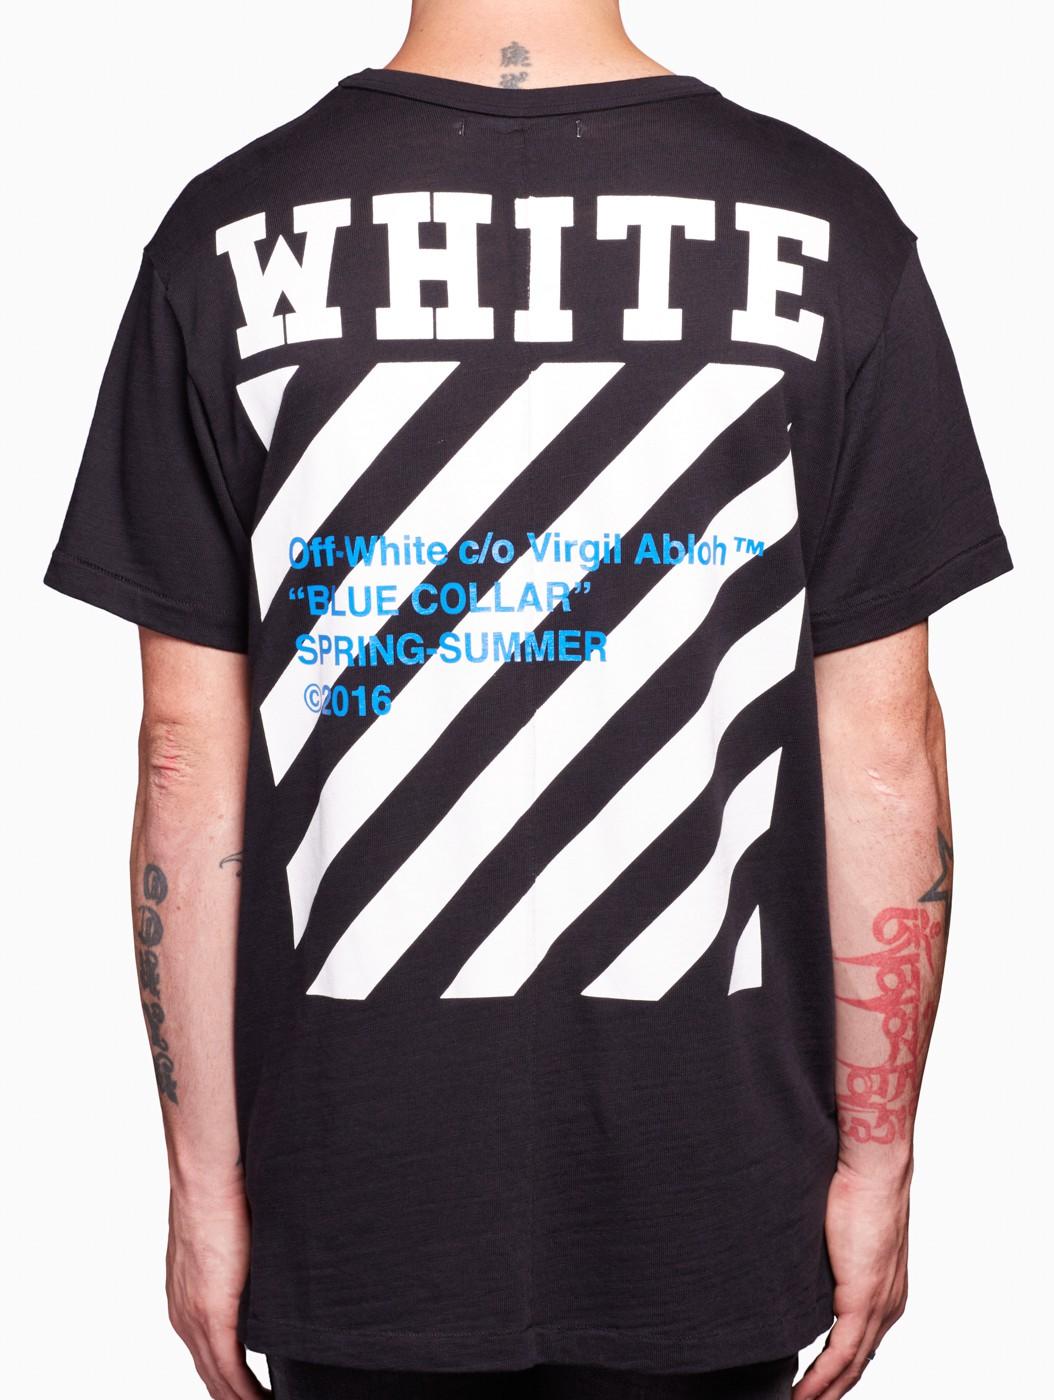 Lyst - Off-White c o Virgil Abloh Blue Collar T-shirt in Black for Men b8fb9aaef37b